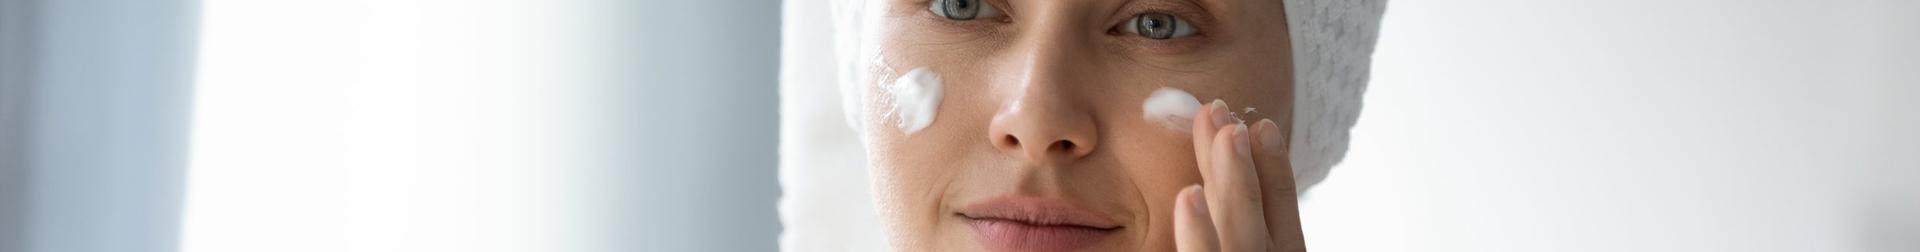 Makeup Products   Buy Best Face Primer Online   AromaCraze